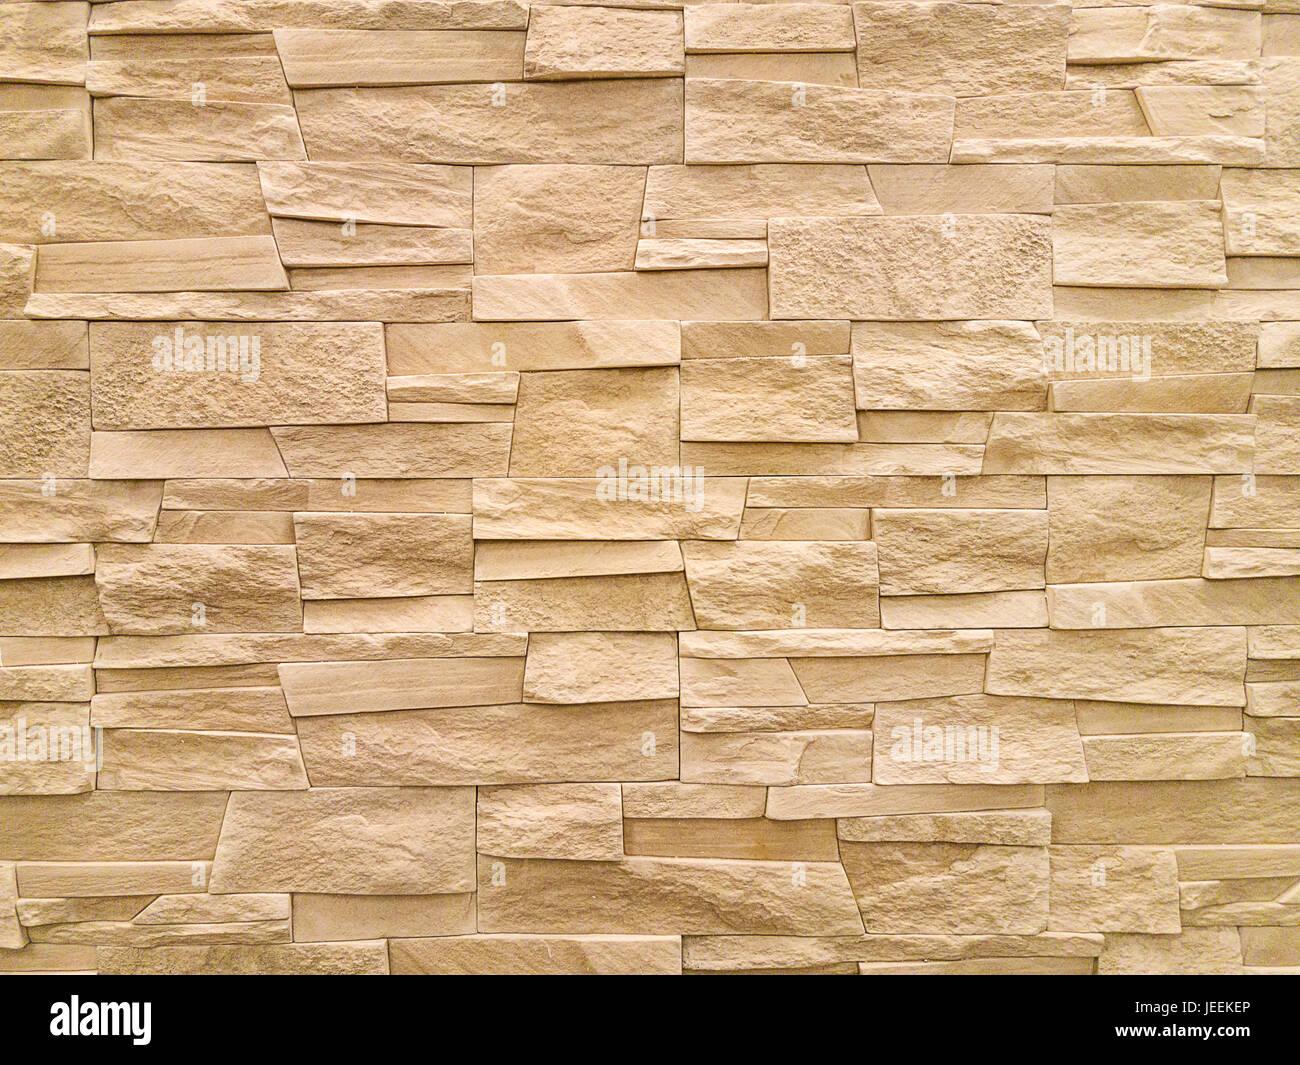 Unique Decorative Stone Wall Blocks Photos - Art & Wall Decor ...